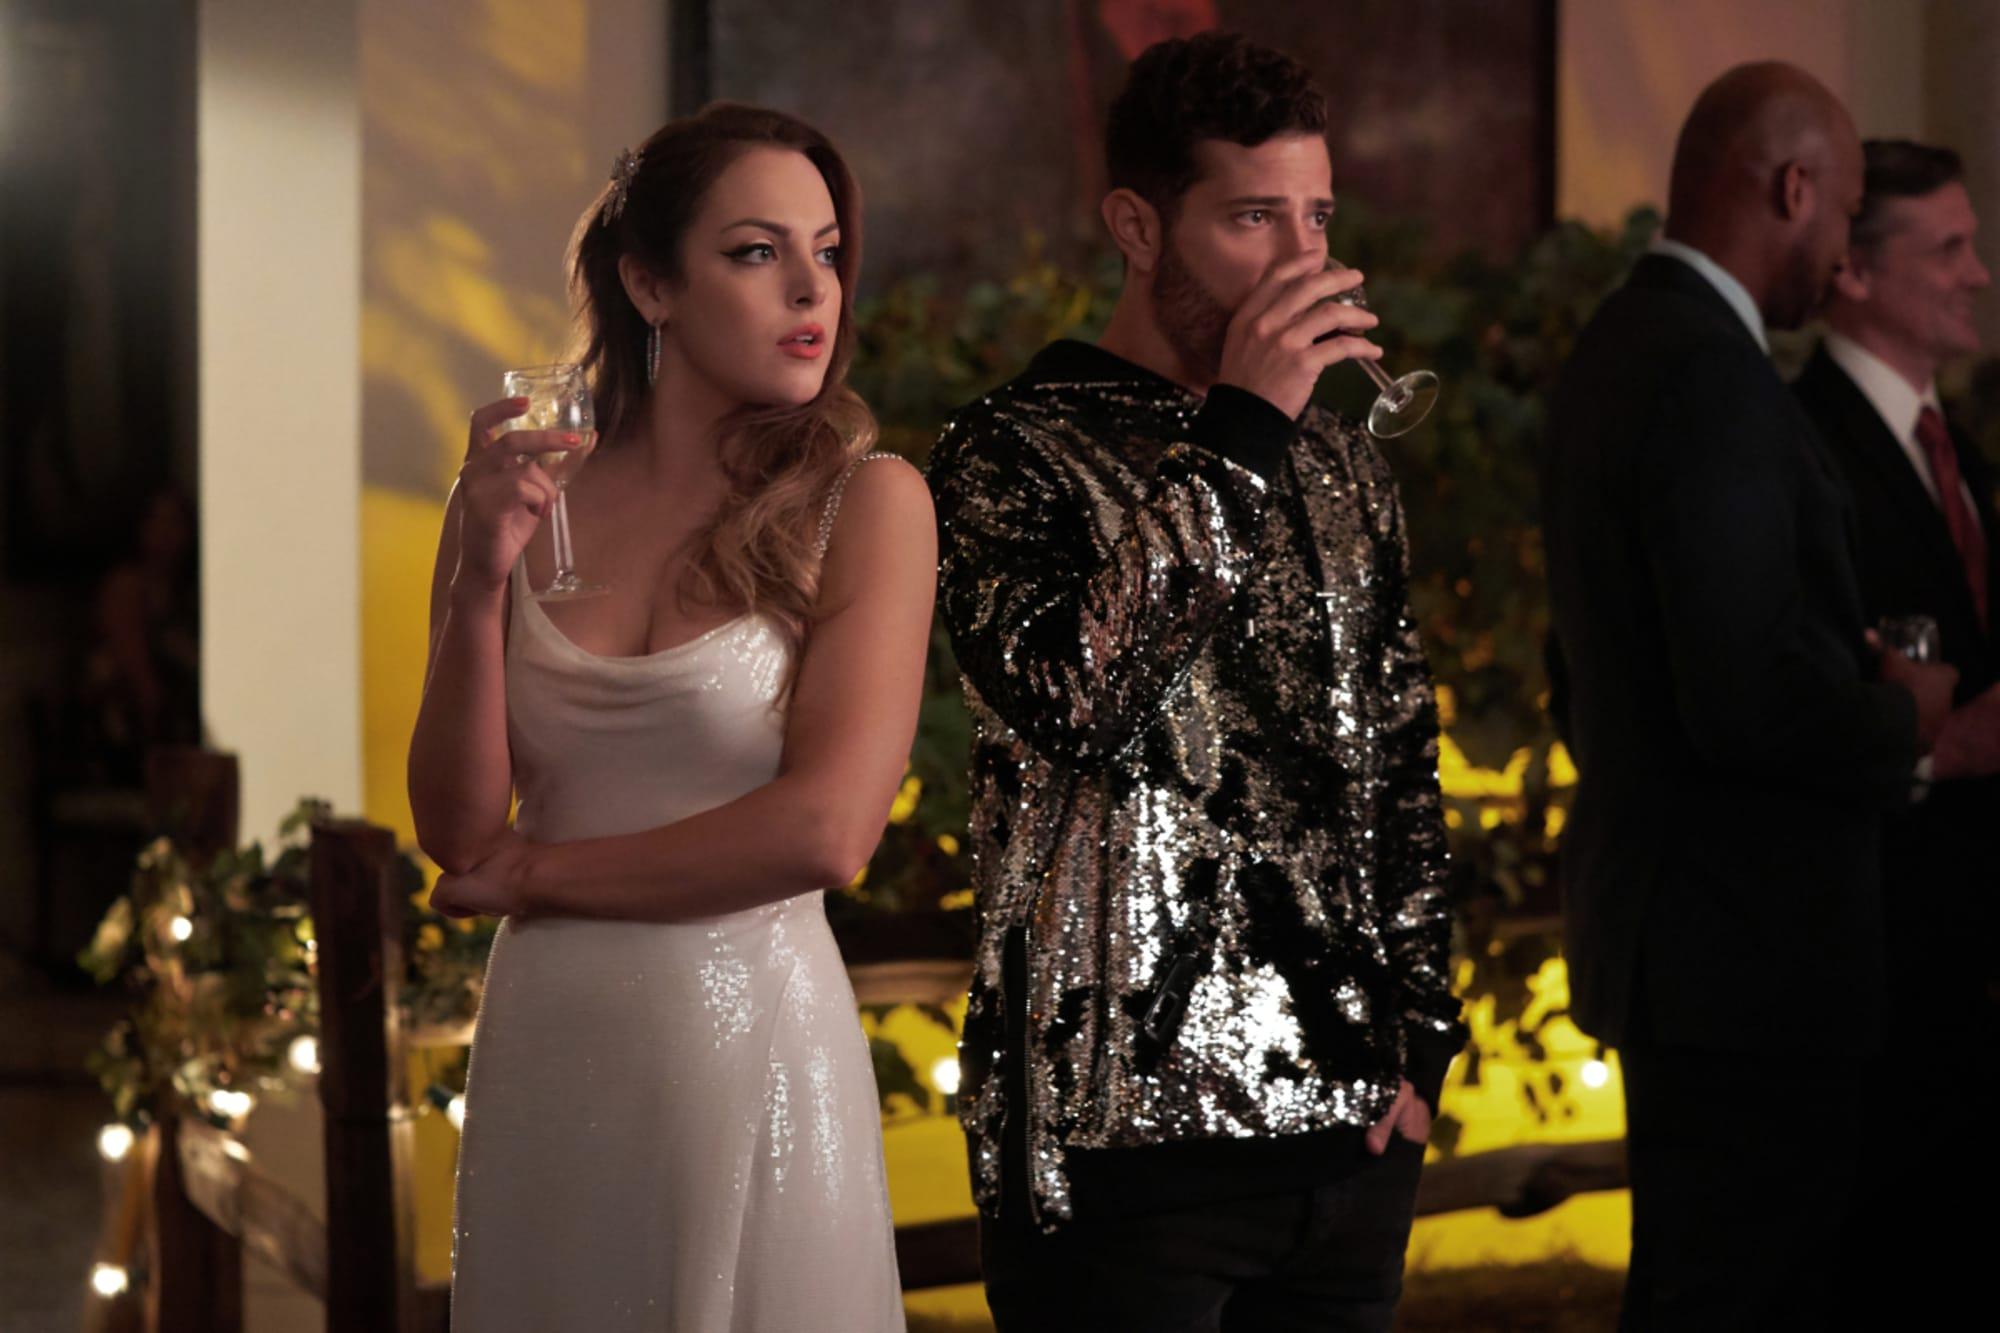 Dynasty Season 5 Release Date Spoiler Watch Online Cast Plot Story & All Episodes